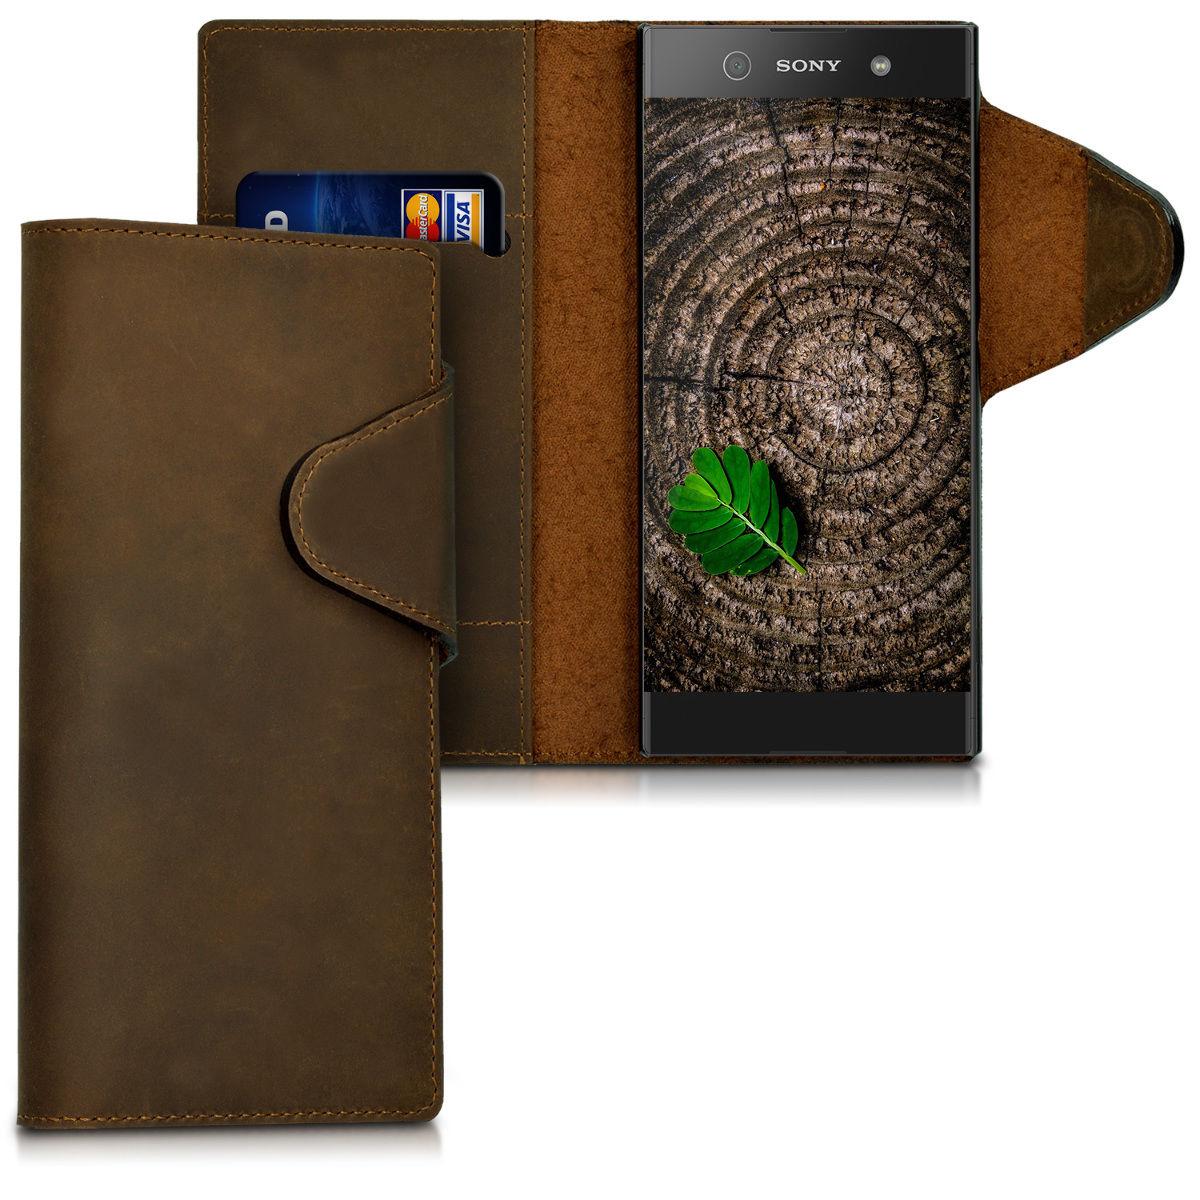 Pouzdro pro Sony Xperia XA1 hnědé